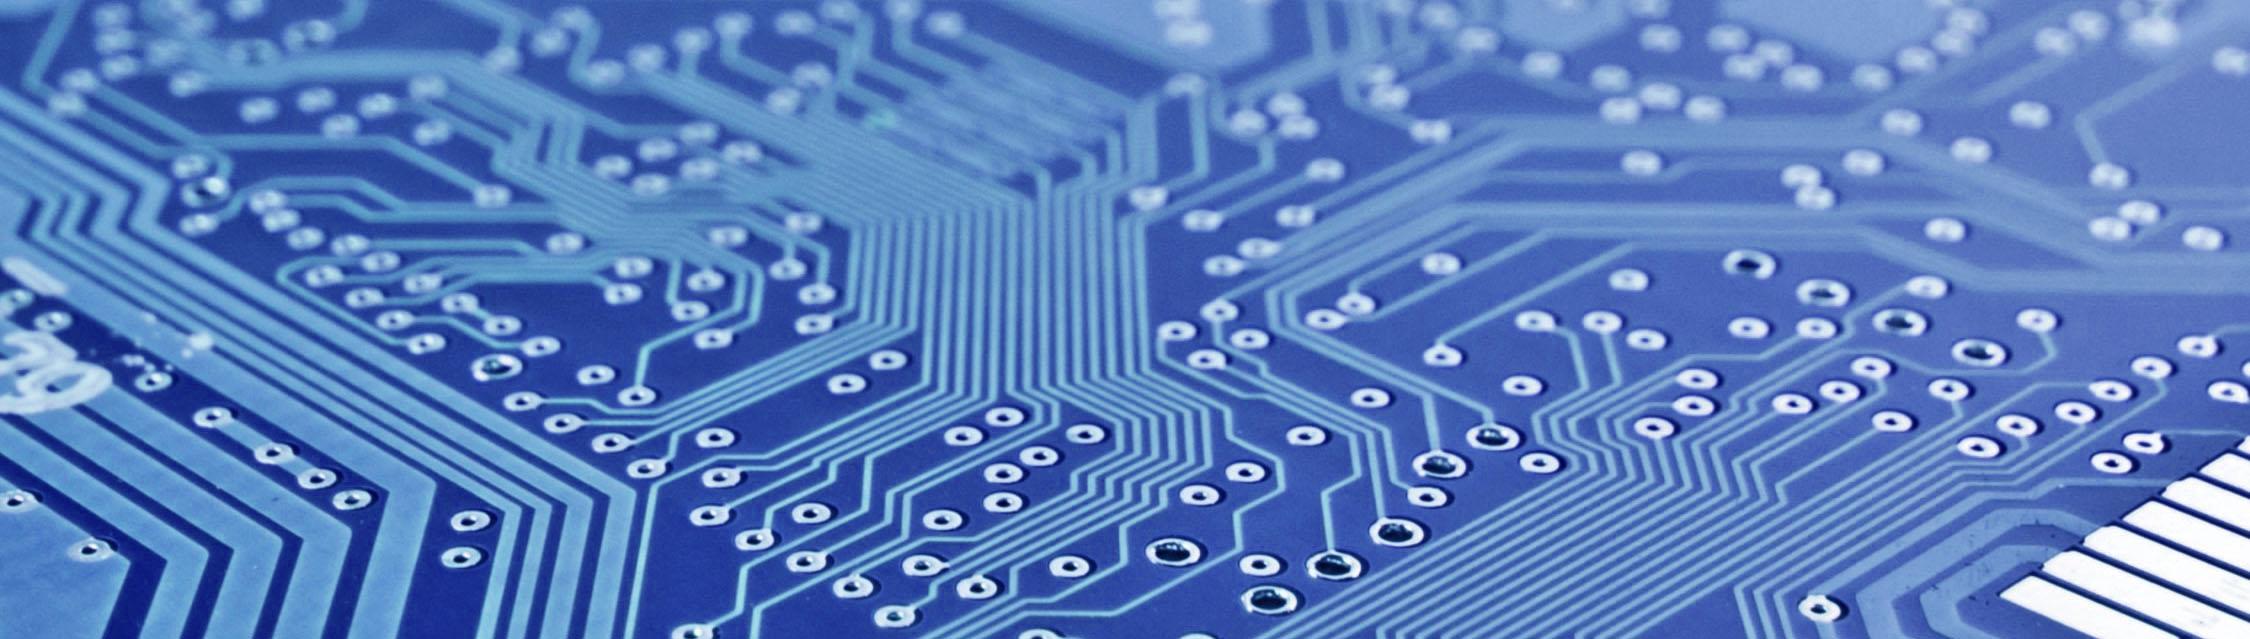 Blue Circuit Board - Image on ORLIN Technologies Ltd Blog Page